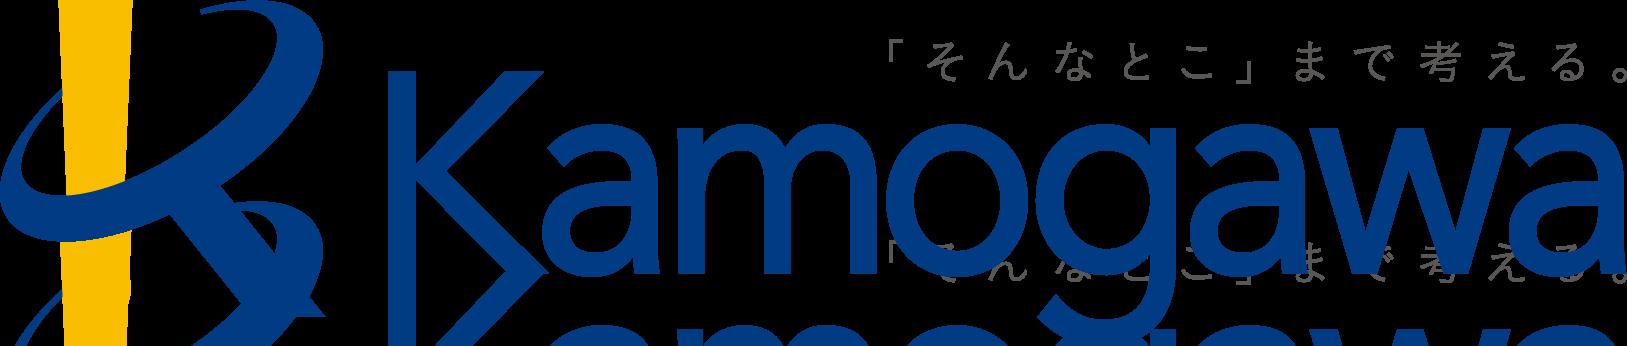 株式会社Kamogawa